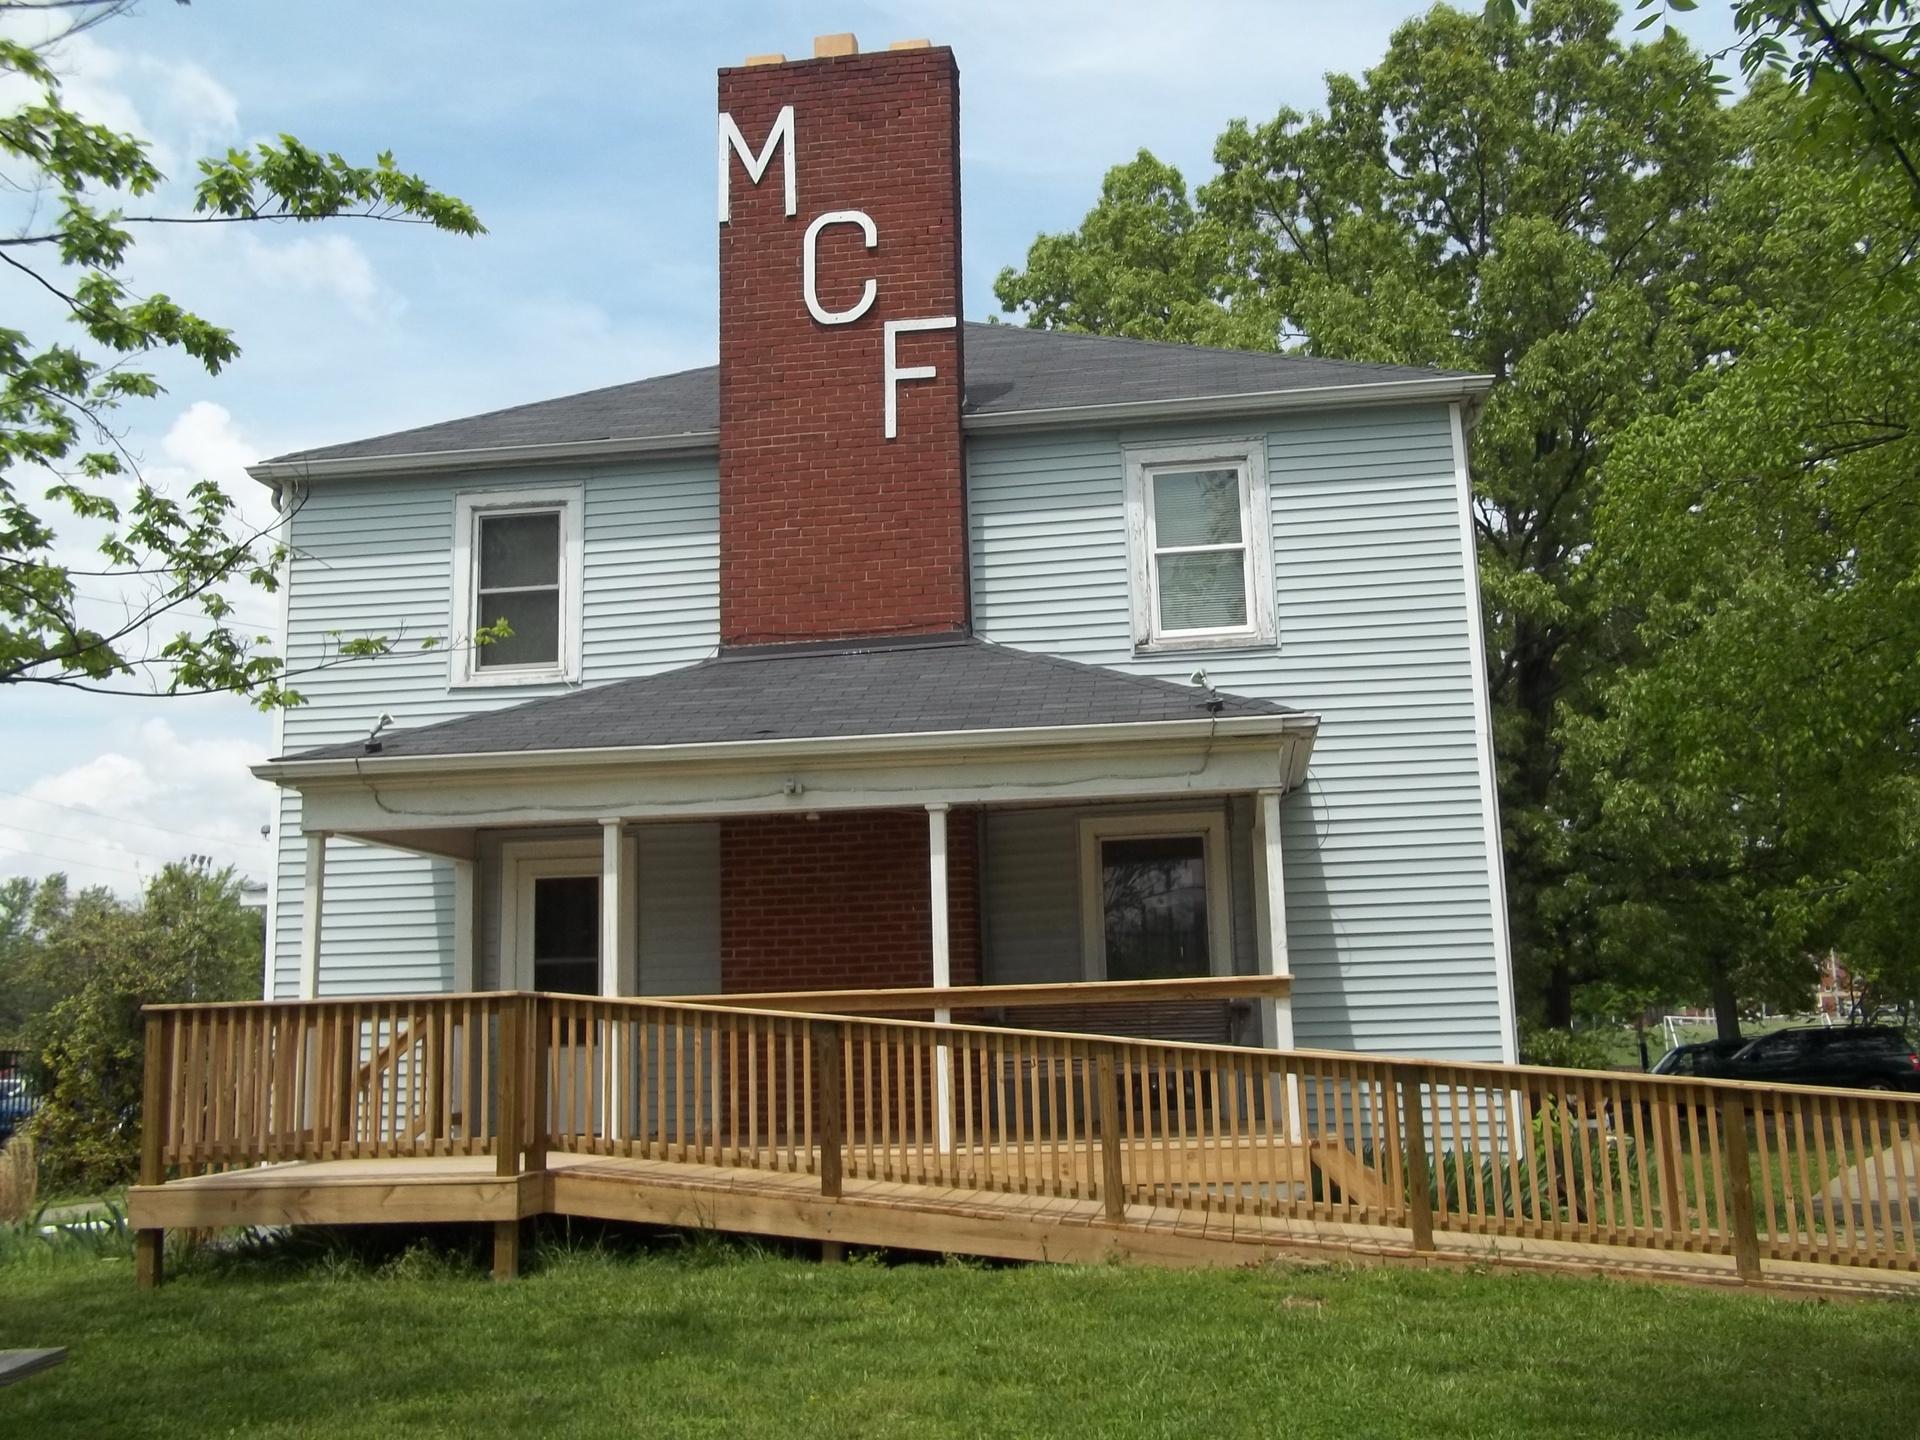 Murray Christian Fellowship, 1508 Chestnut Street, Murray, KY , 42071, United States